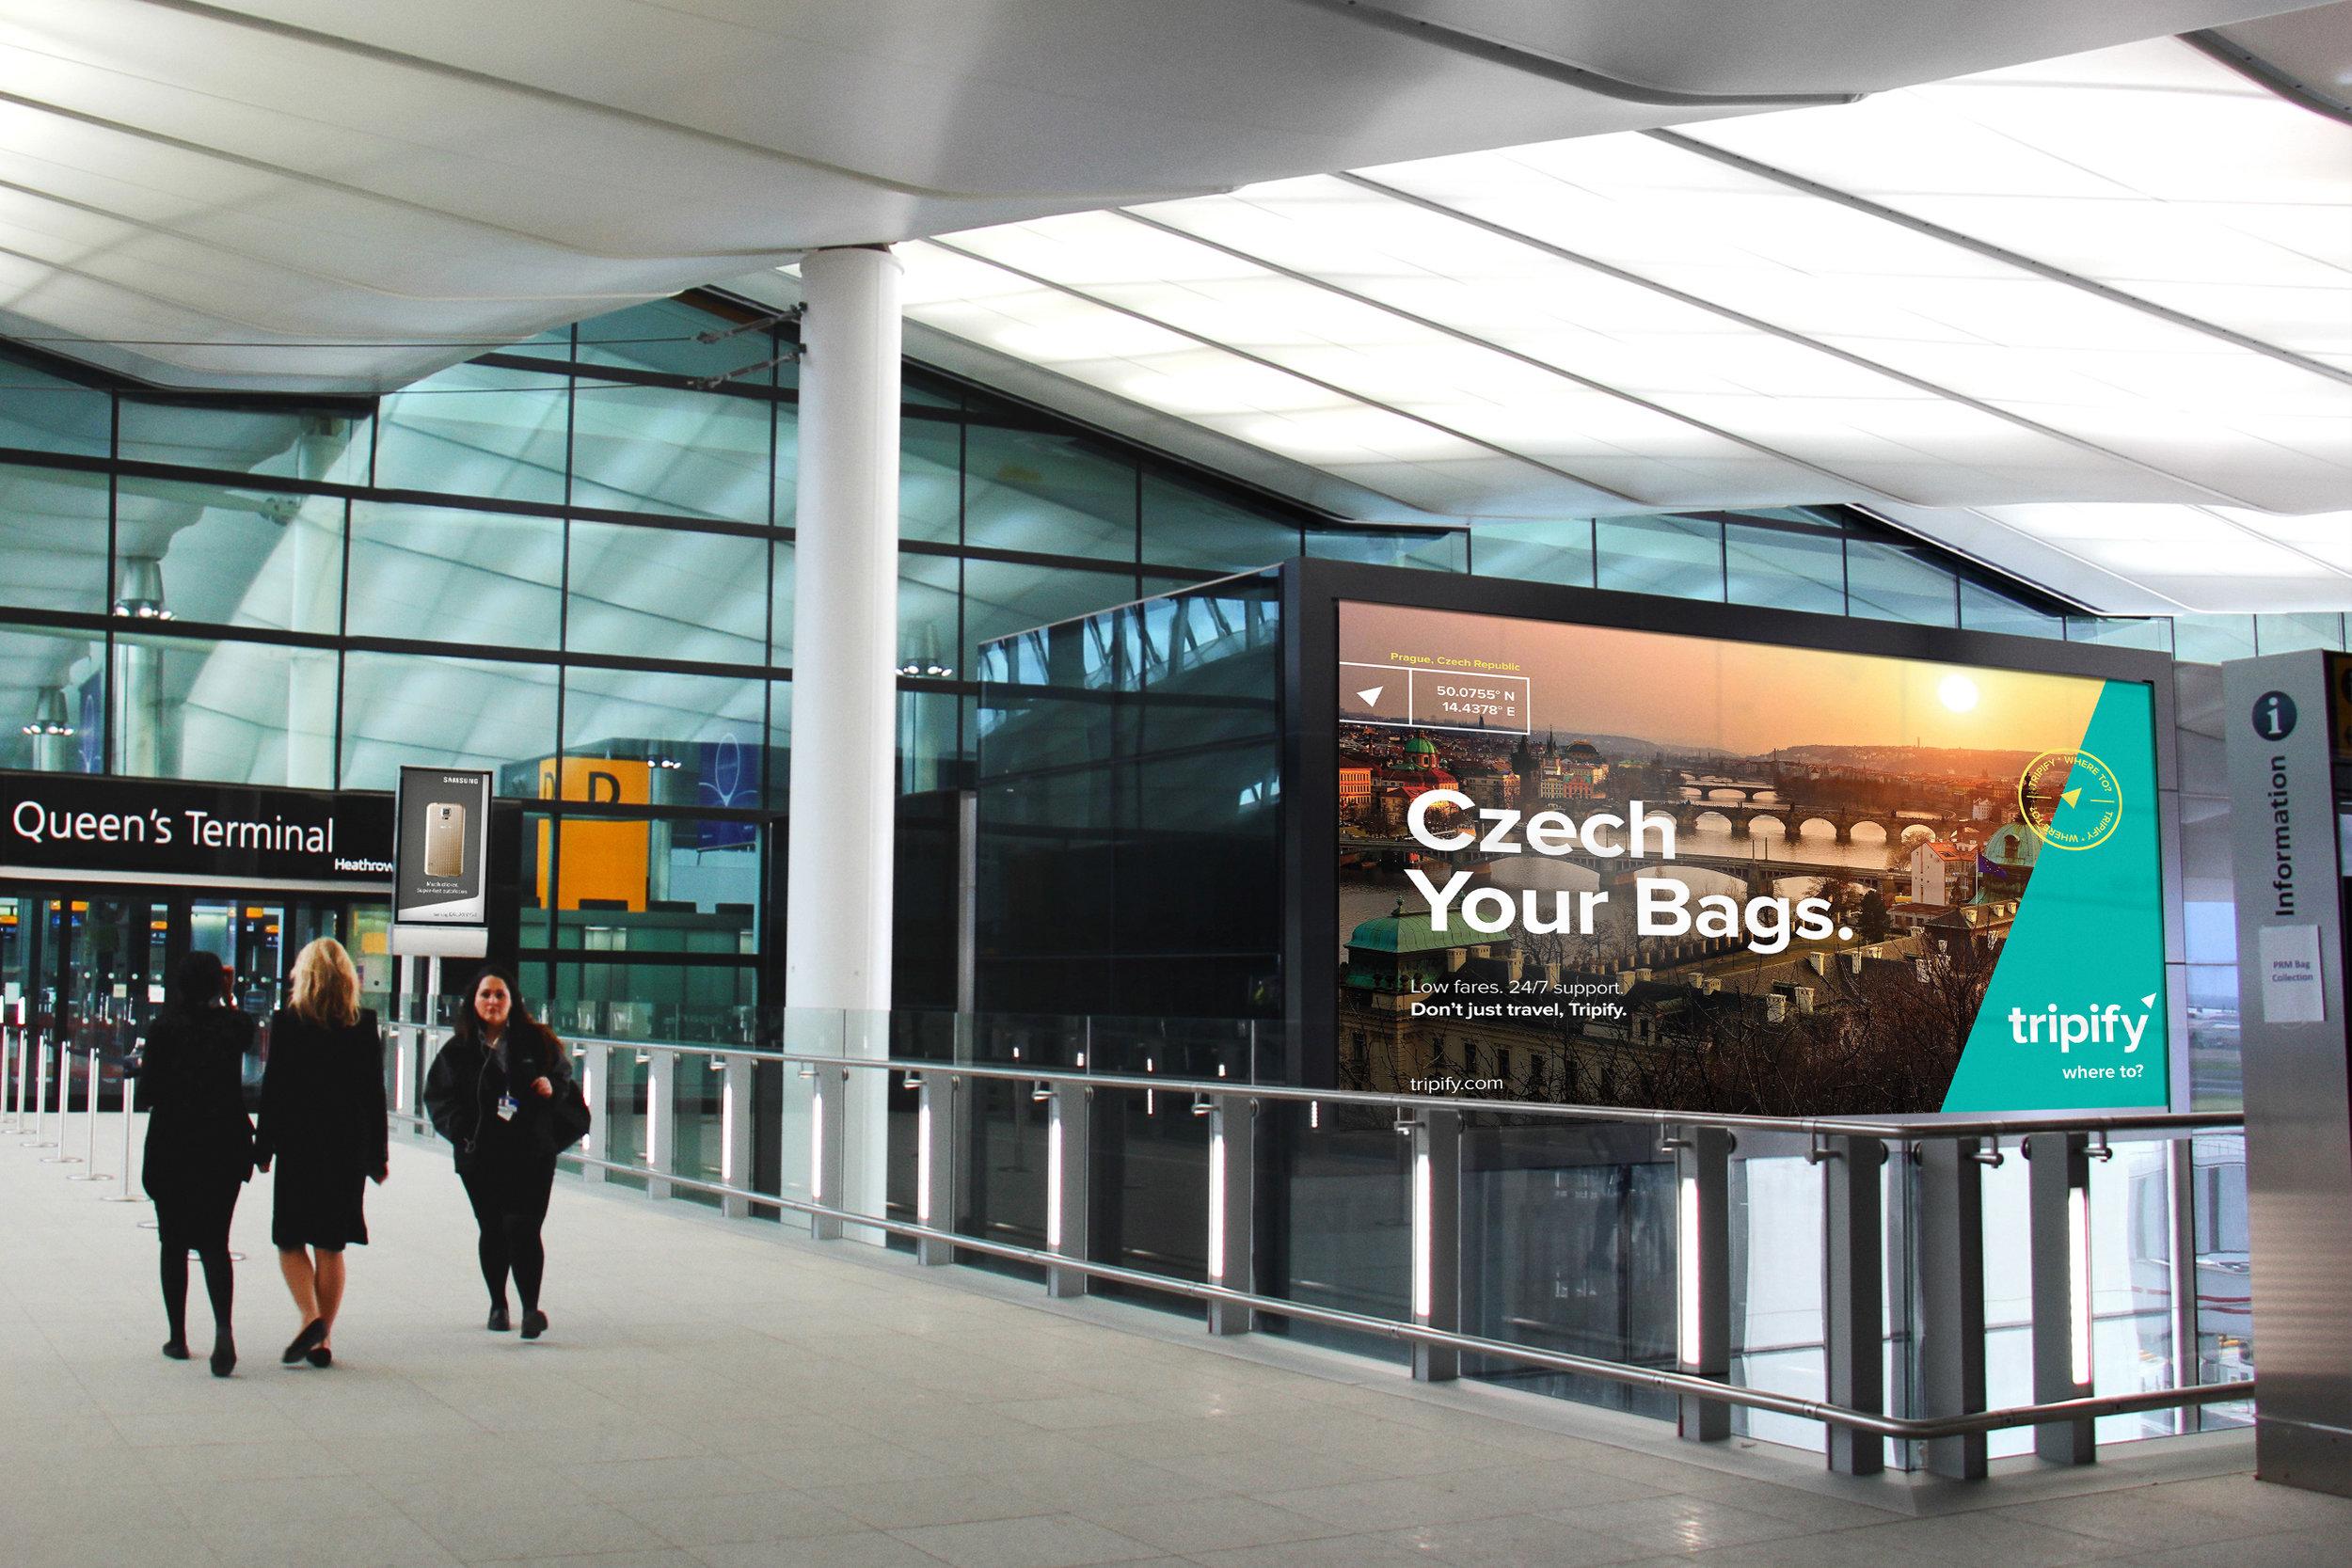 Tripify_Comp_Heathrow_Airport_2.jpg